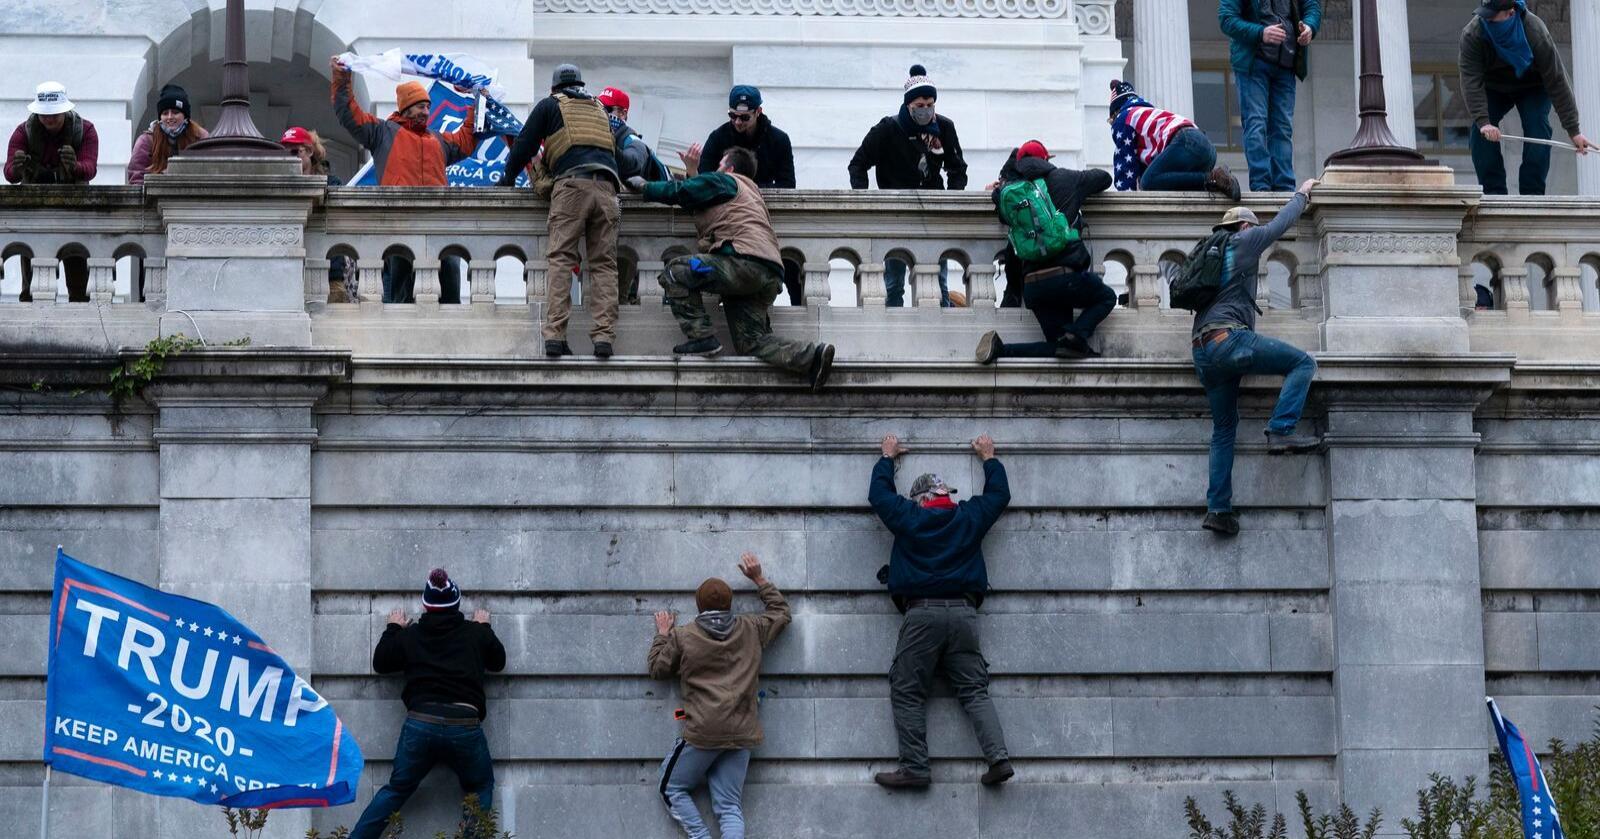 Tilhengere av Donald Trump stormer Kongressen i Washington, D.C. Foto: AP Photo/Jose Luis Magana